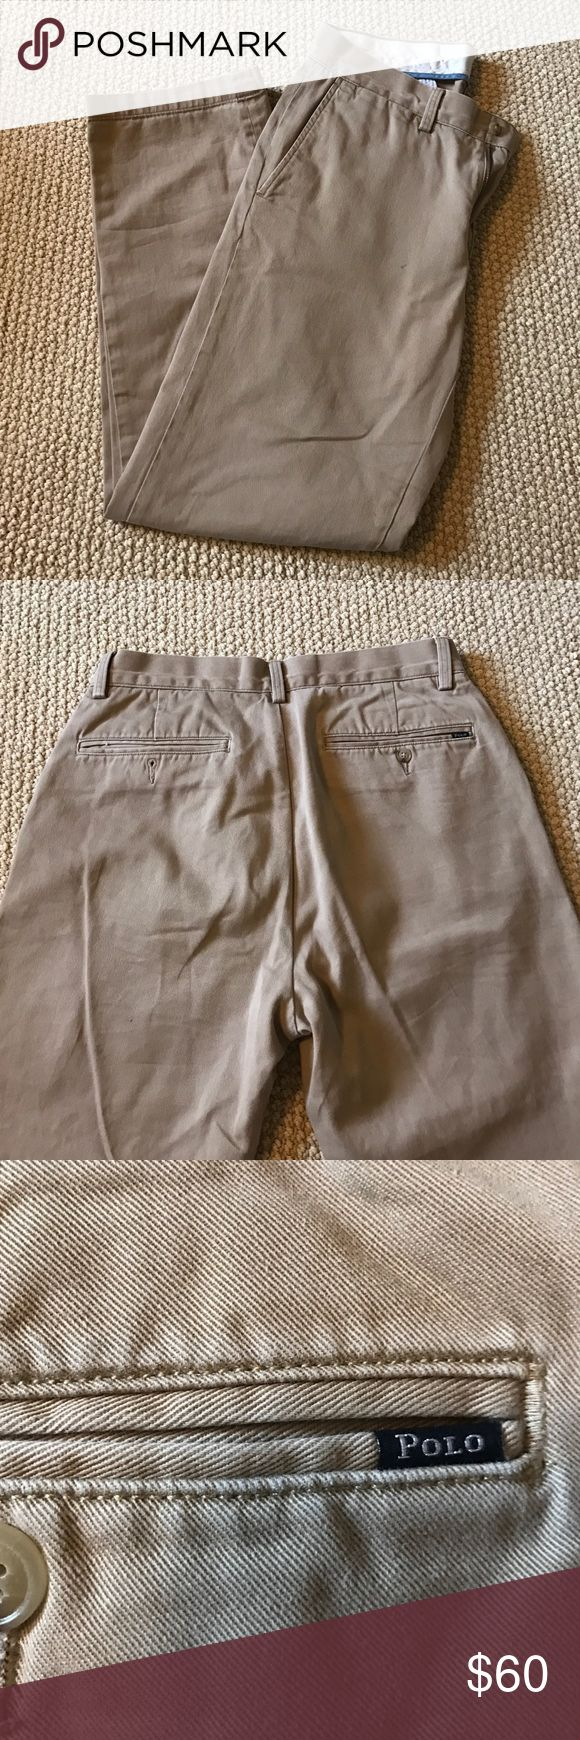 Men's Polo Ralph Lauren khaki's Men's Polo Ralph Lauren khaki's! Size 30/30. Classic fit. Only worn a few times! Polo by Ralph Lauren Pants Chinos & Khakis